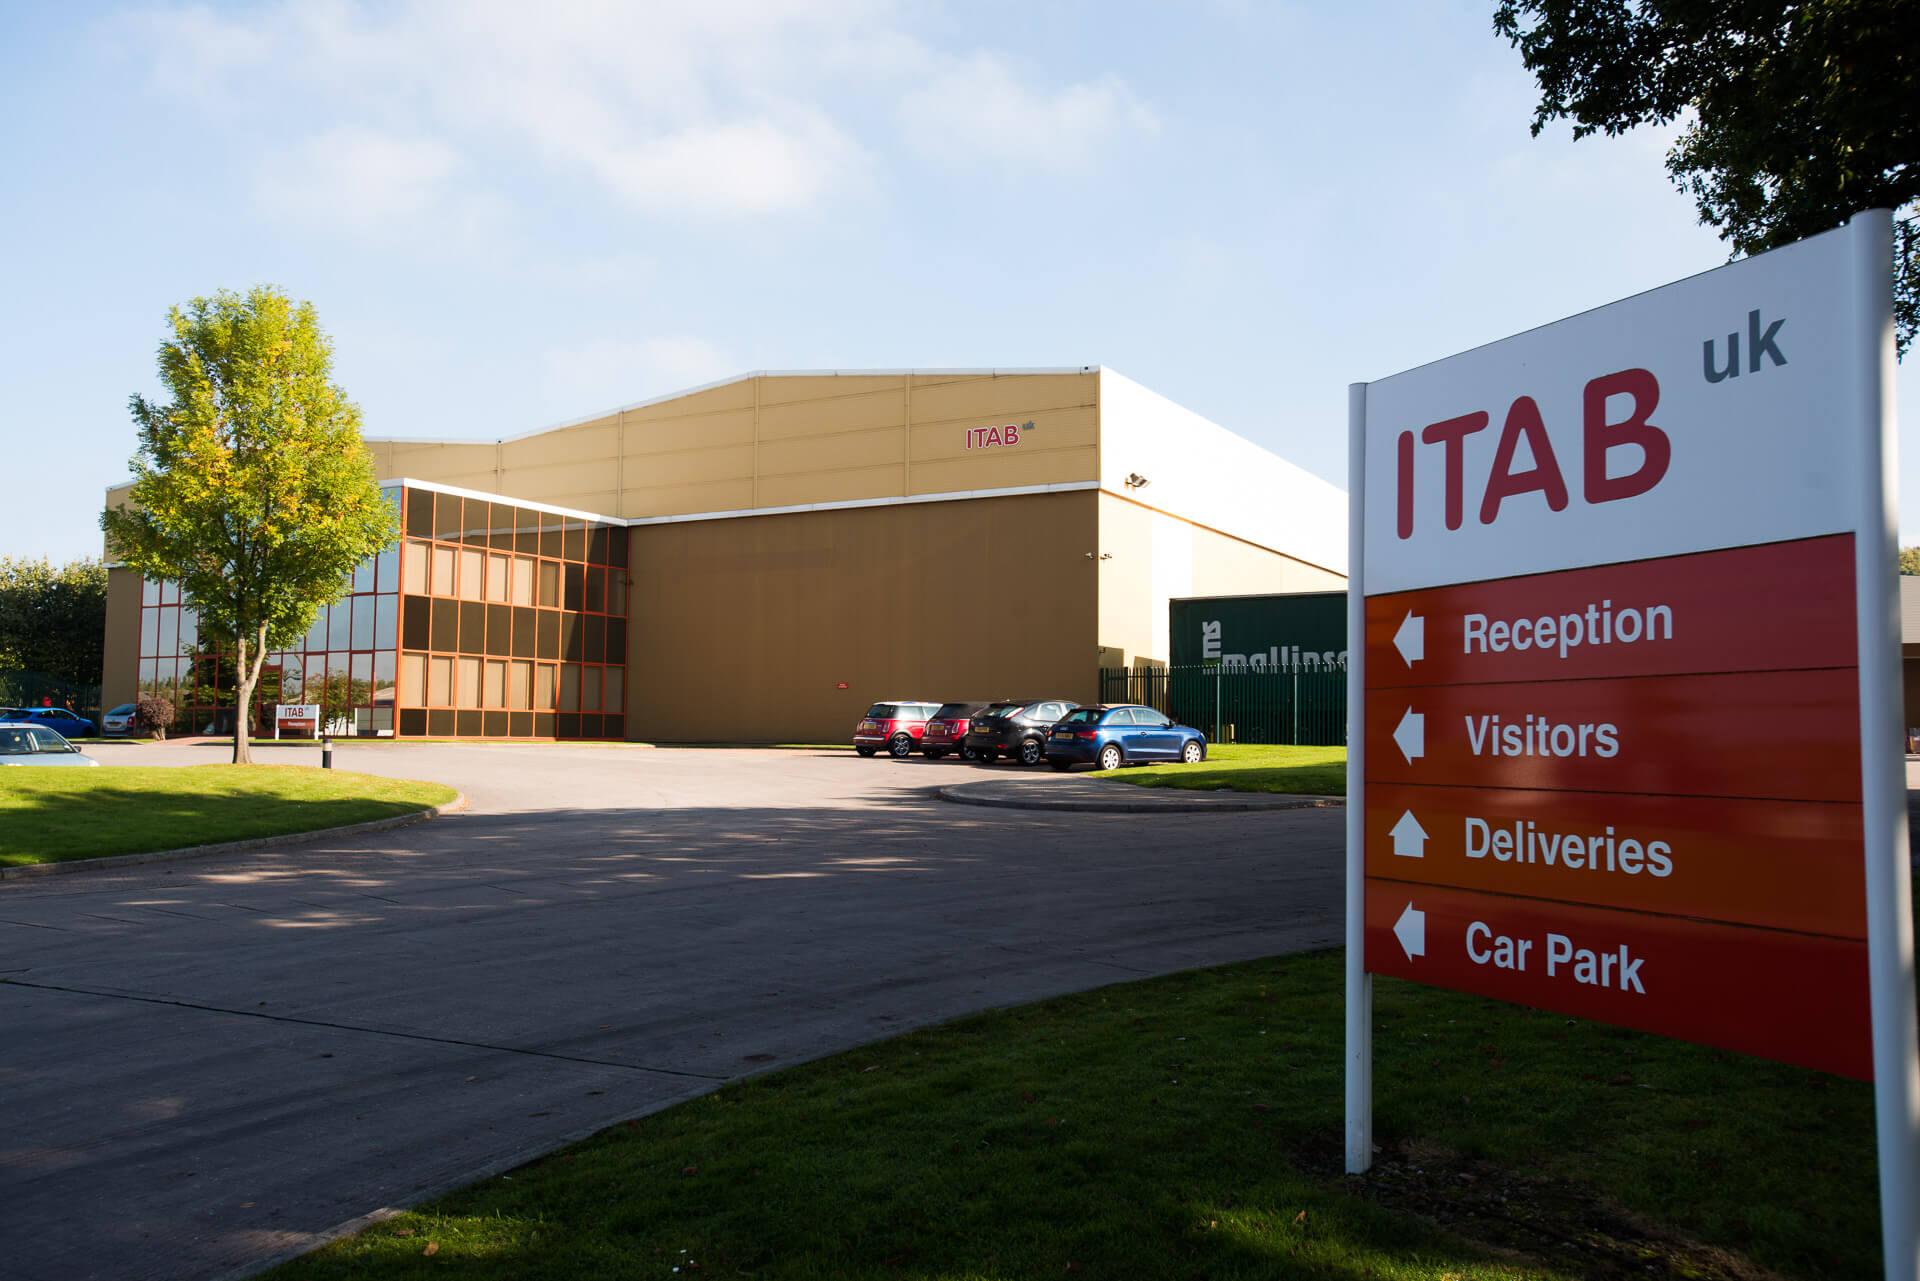 ITAB Tankersley, Barnsley, ITAB Shop Concept